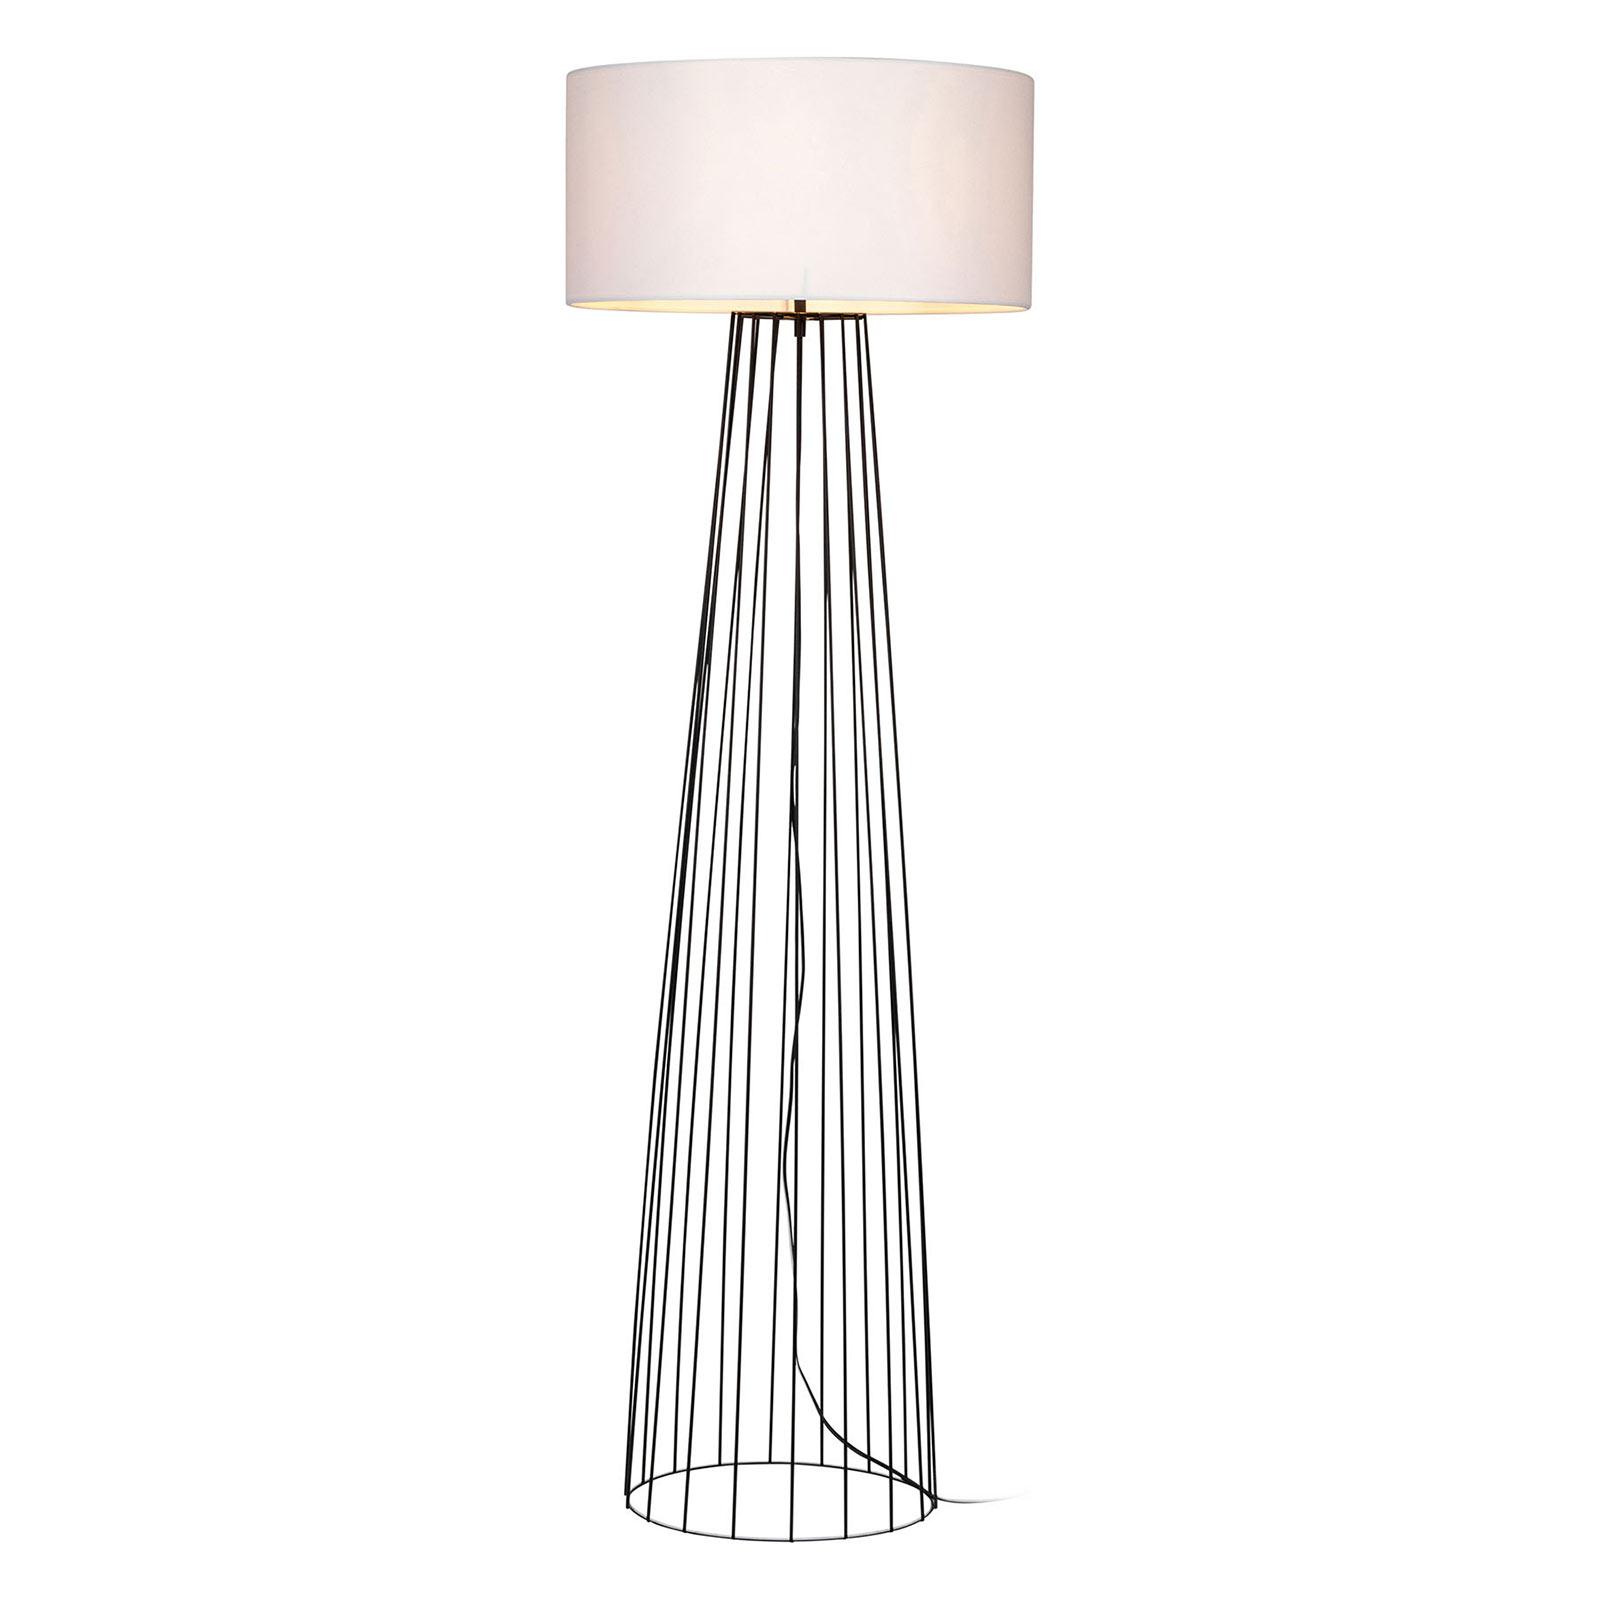 Lámpara de pie Valene con pantalla textil, blanco